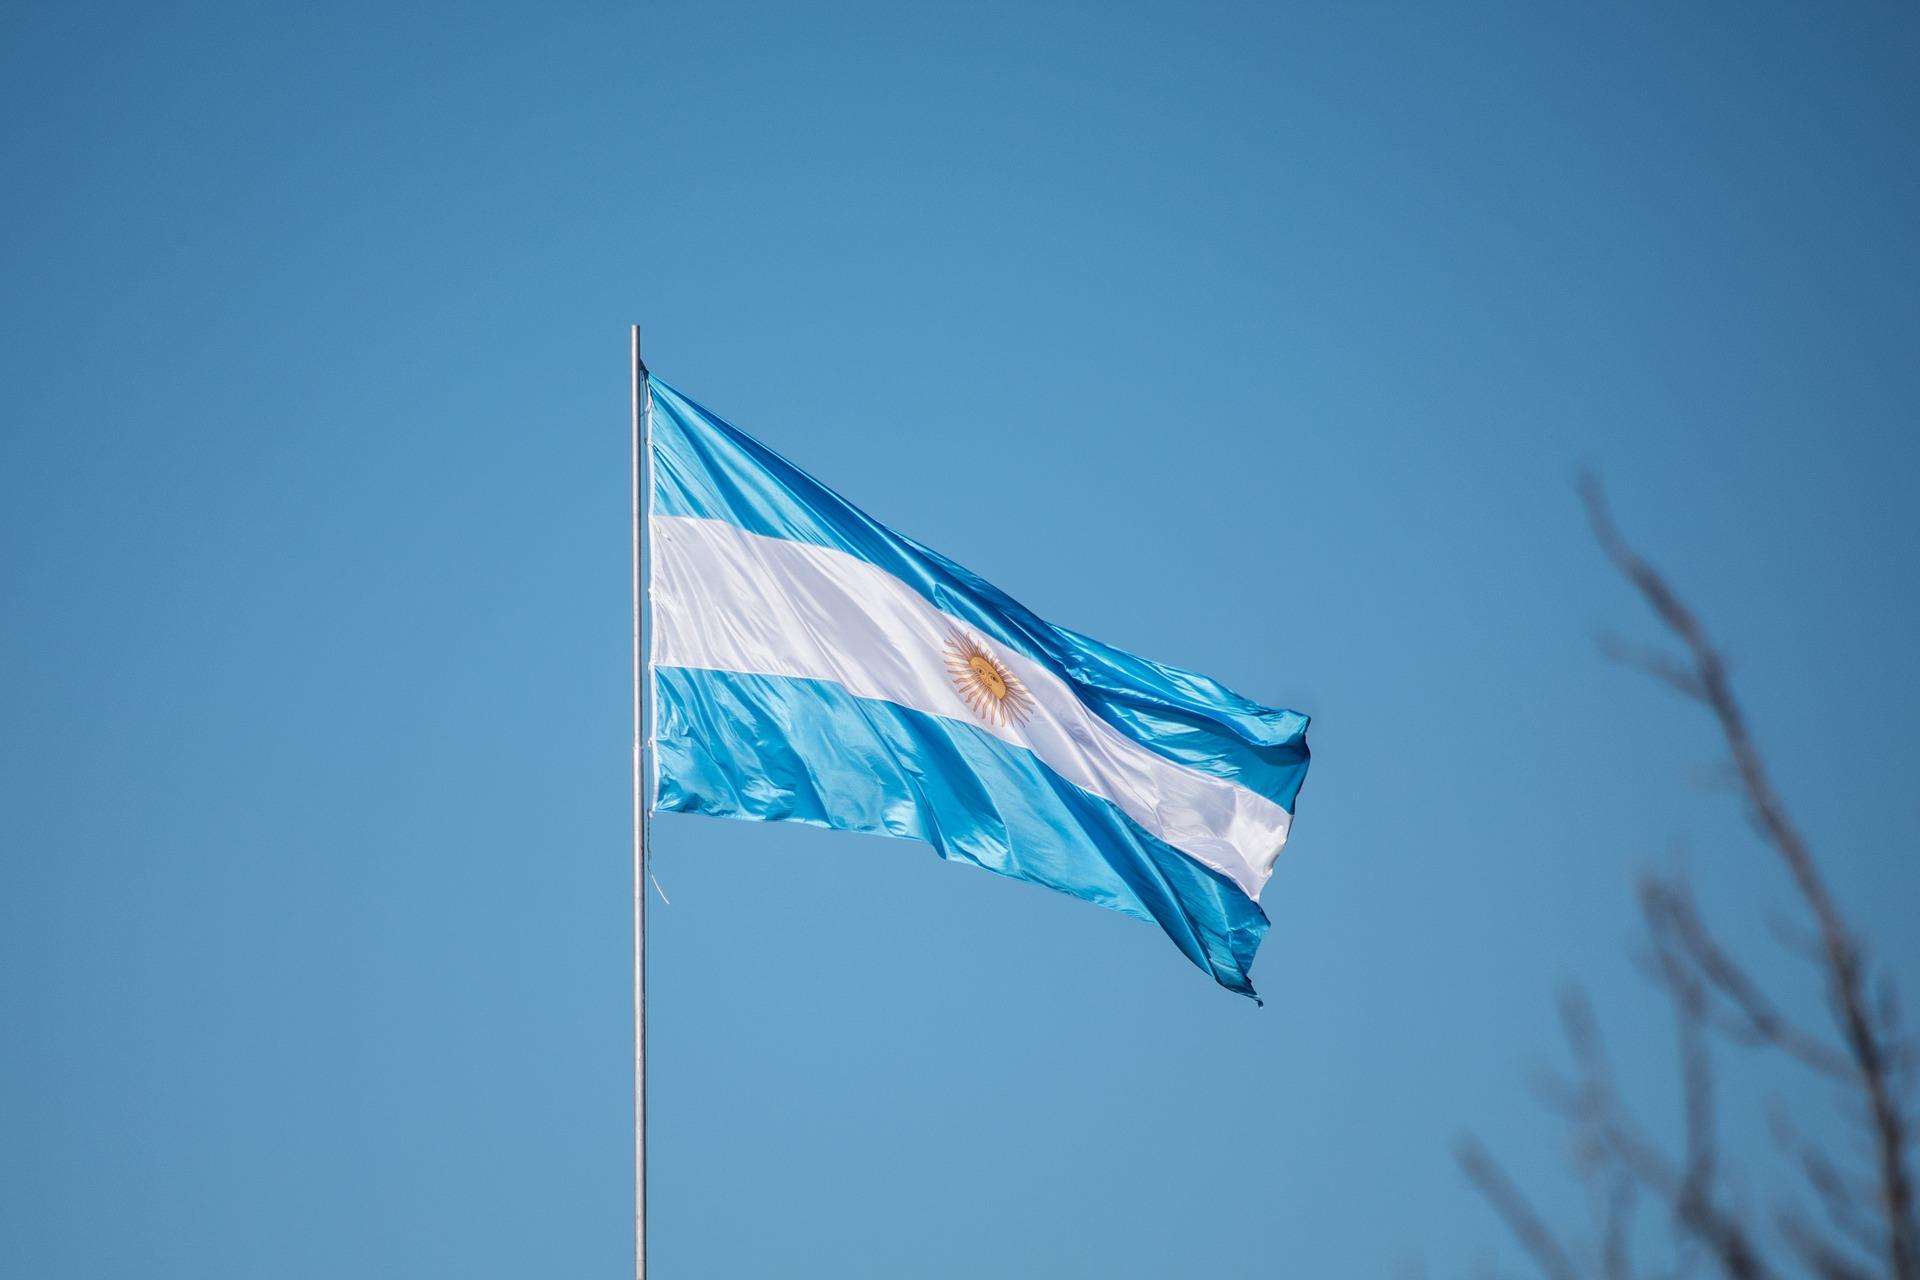 ваш аргентина флаг фото подходящую